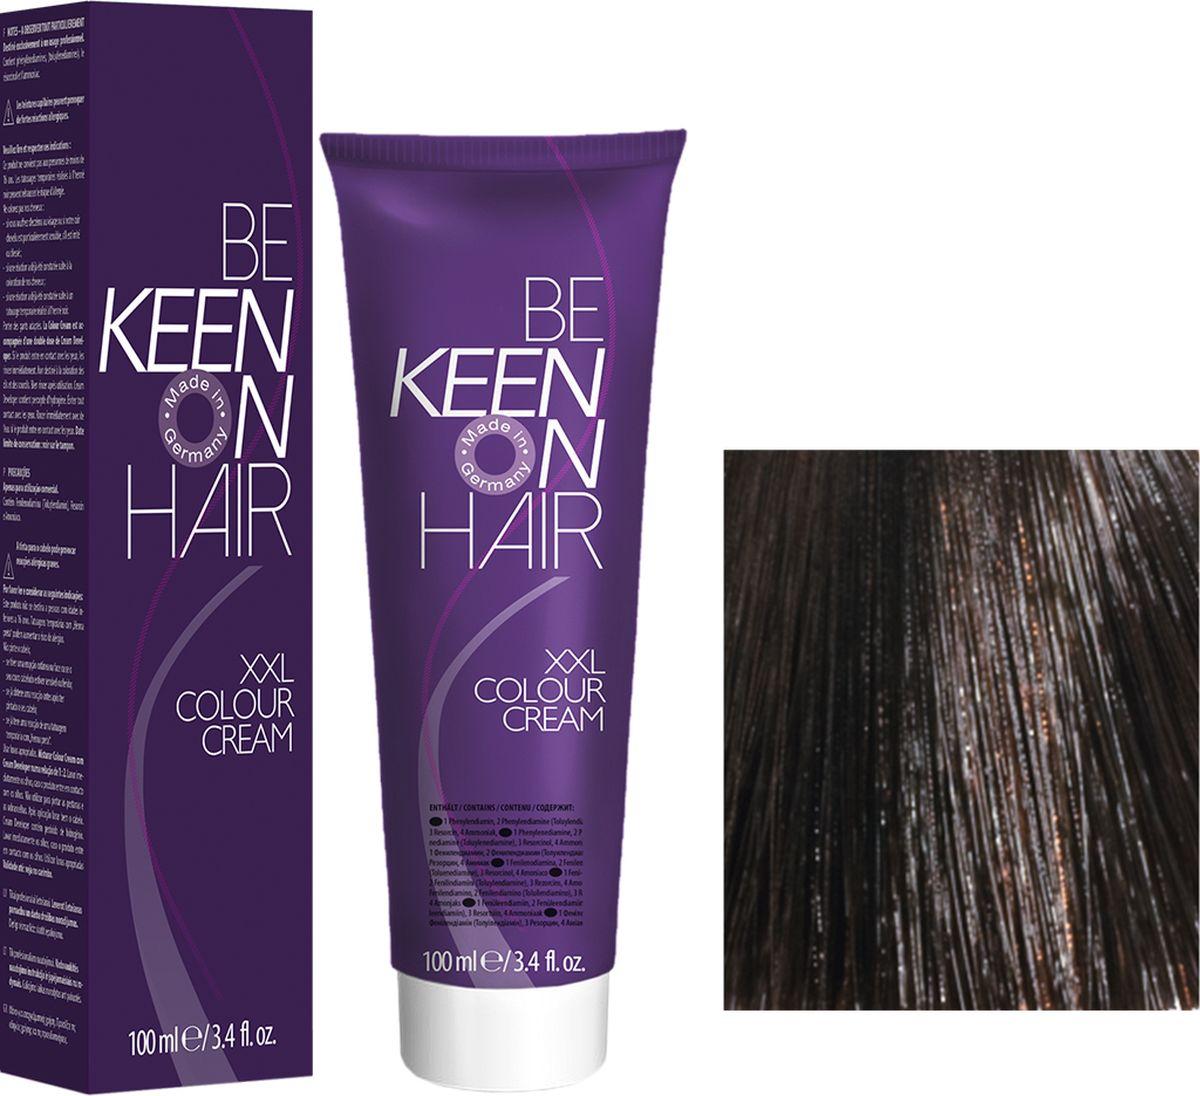 KeenКраска для волос 6. 71 Табак Tabak, 100 мл Keen